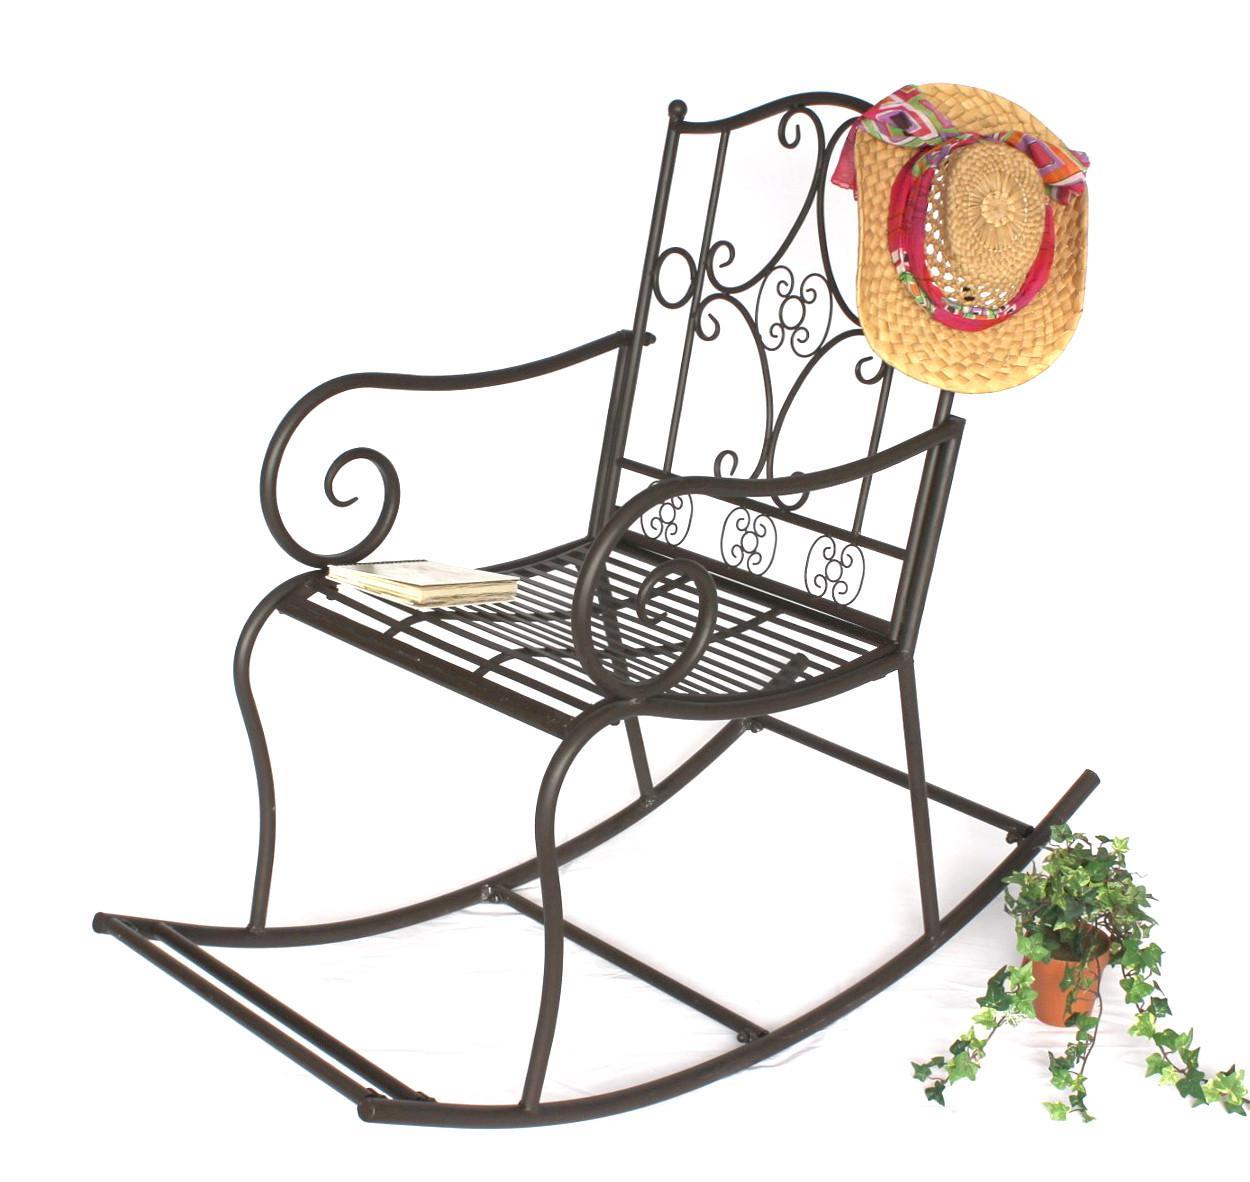 Awesome Garten Gartenstuhl Metall Stuhl Schaukel Dy Grau Braun Eisen Antik  With Gartenstuhl Eisen Antik